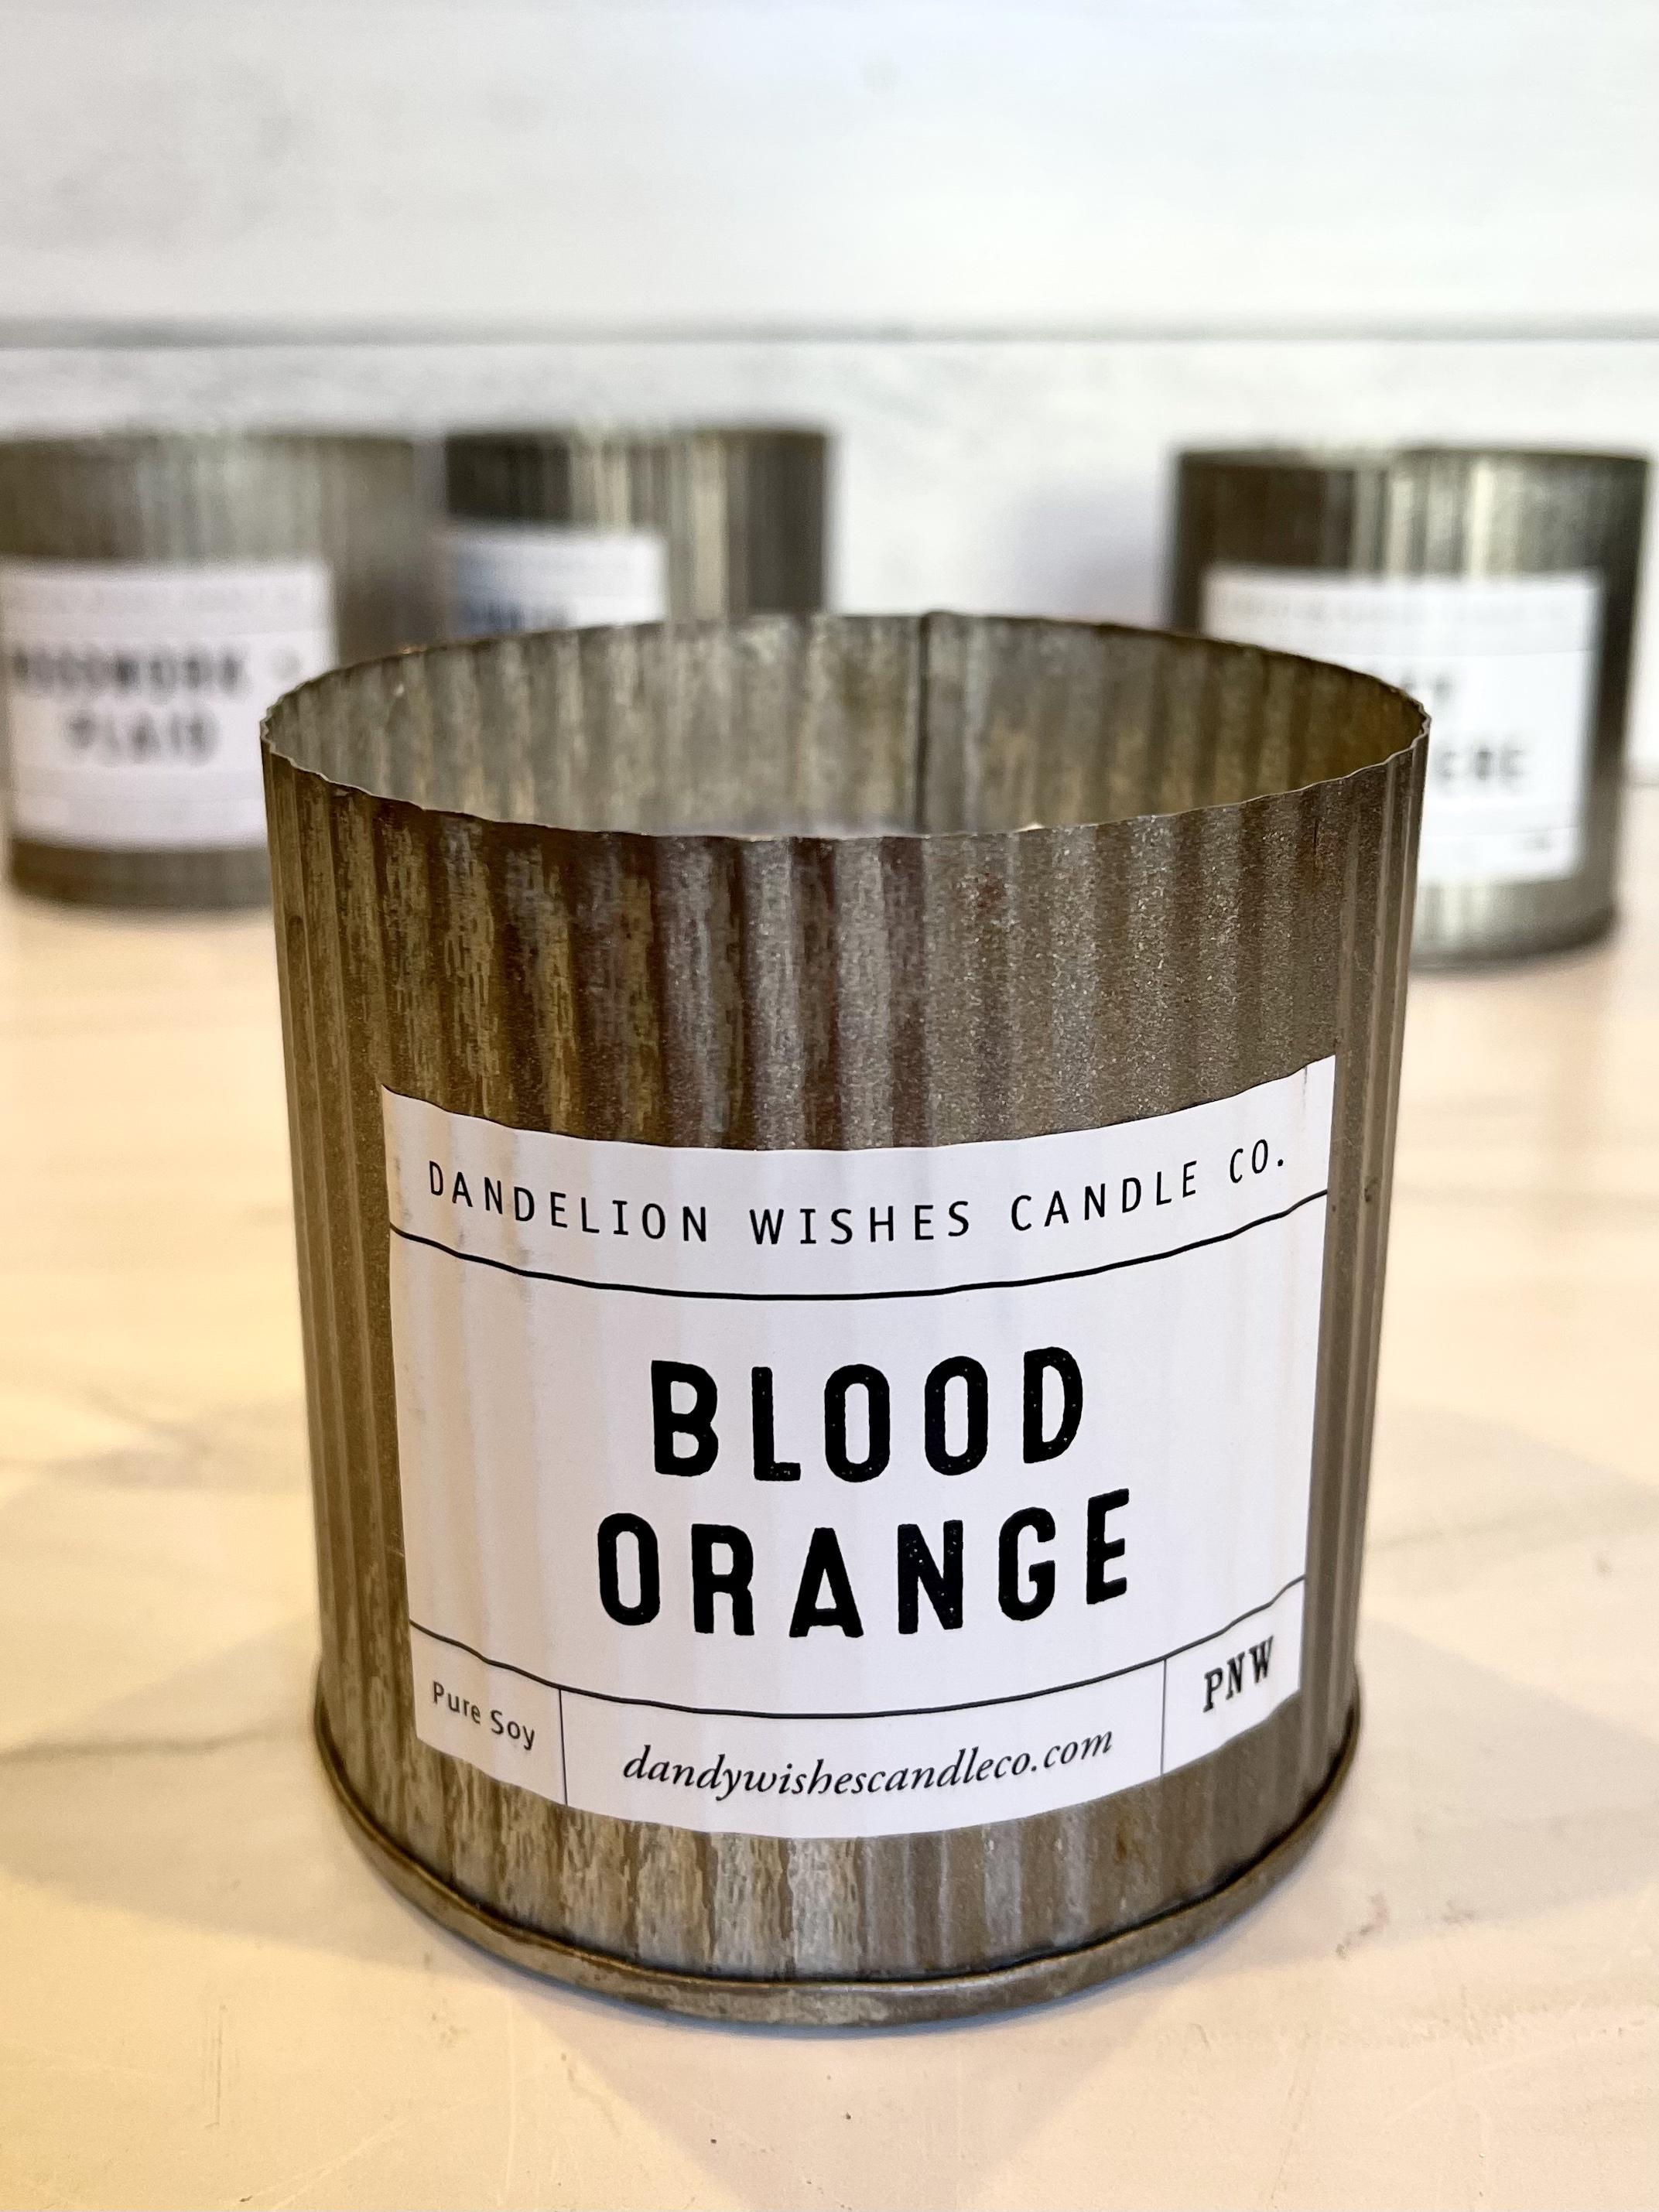 Blood Orange, Rustic Galvanized Tin Candle, 12oz